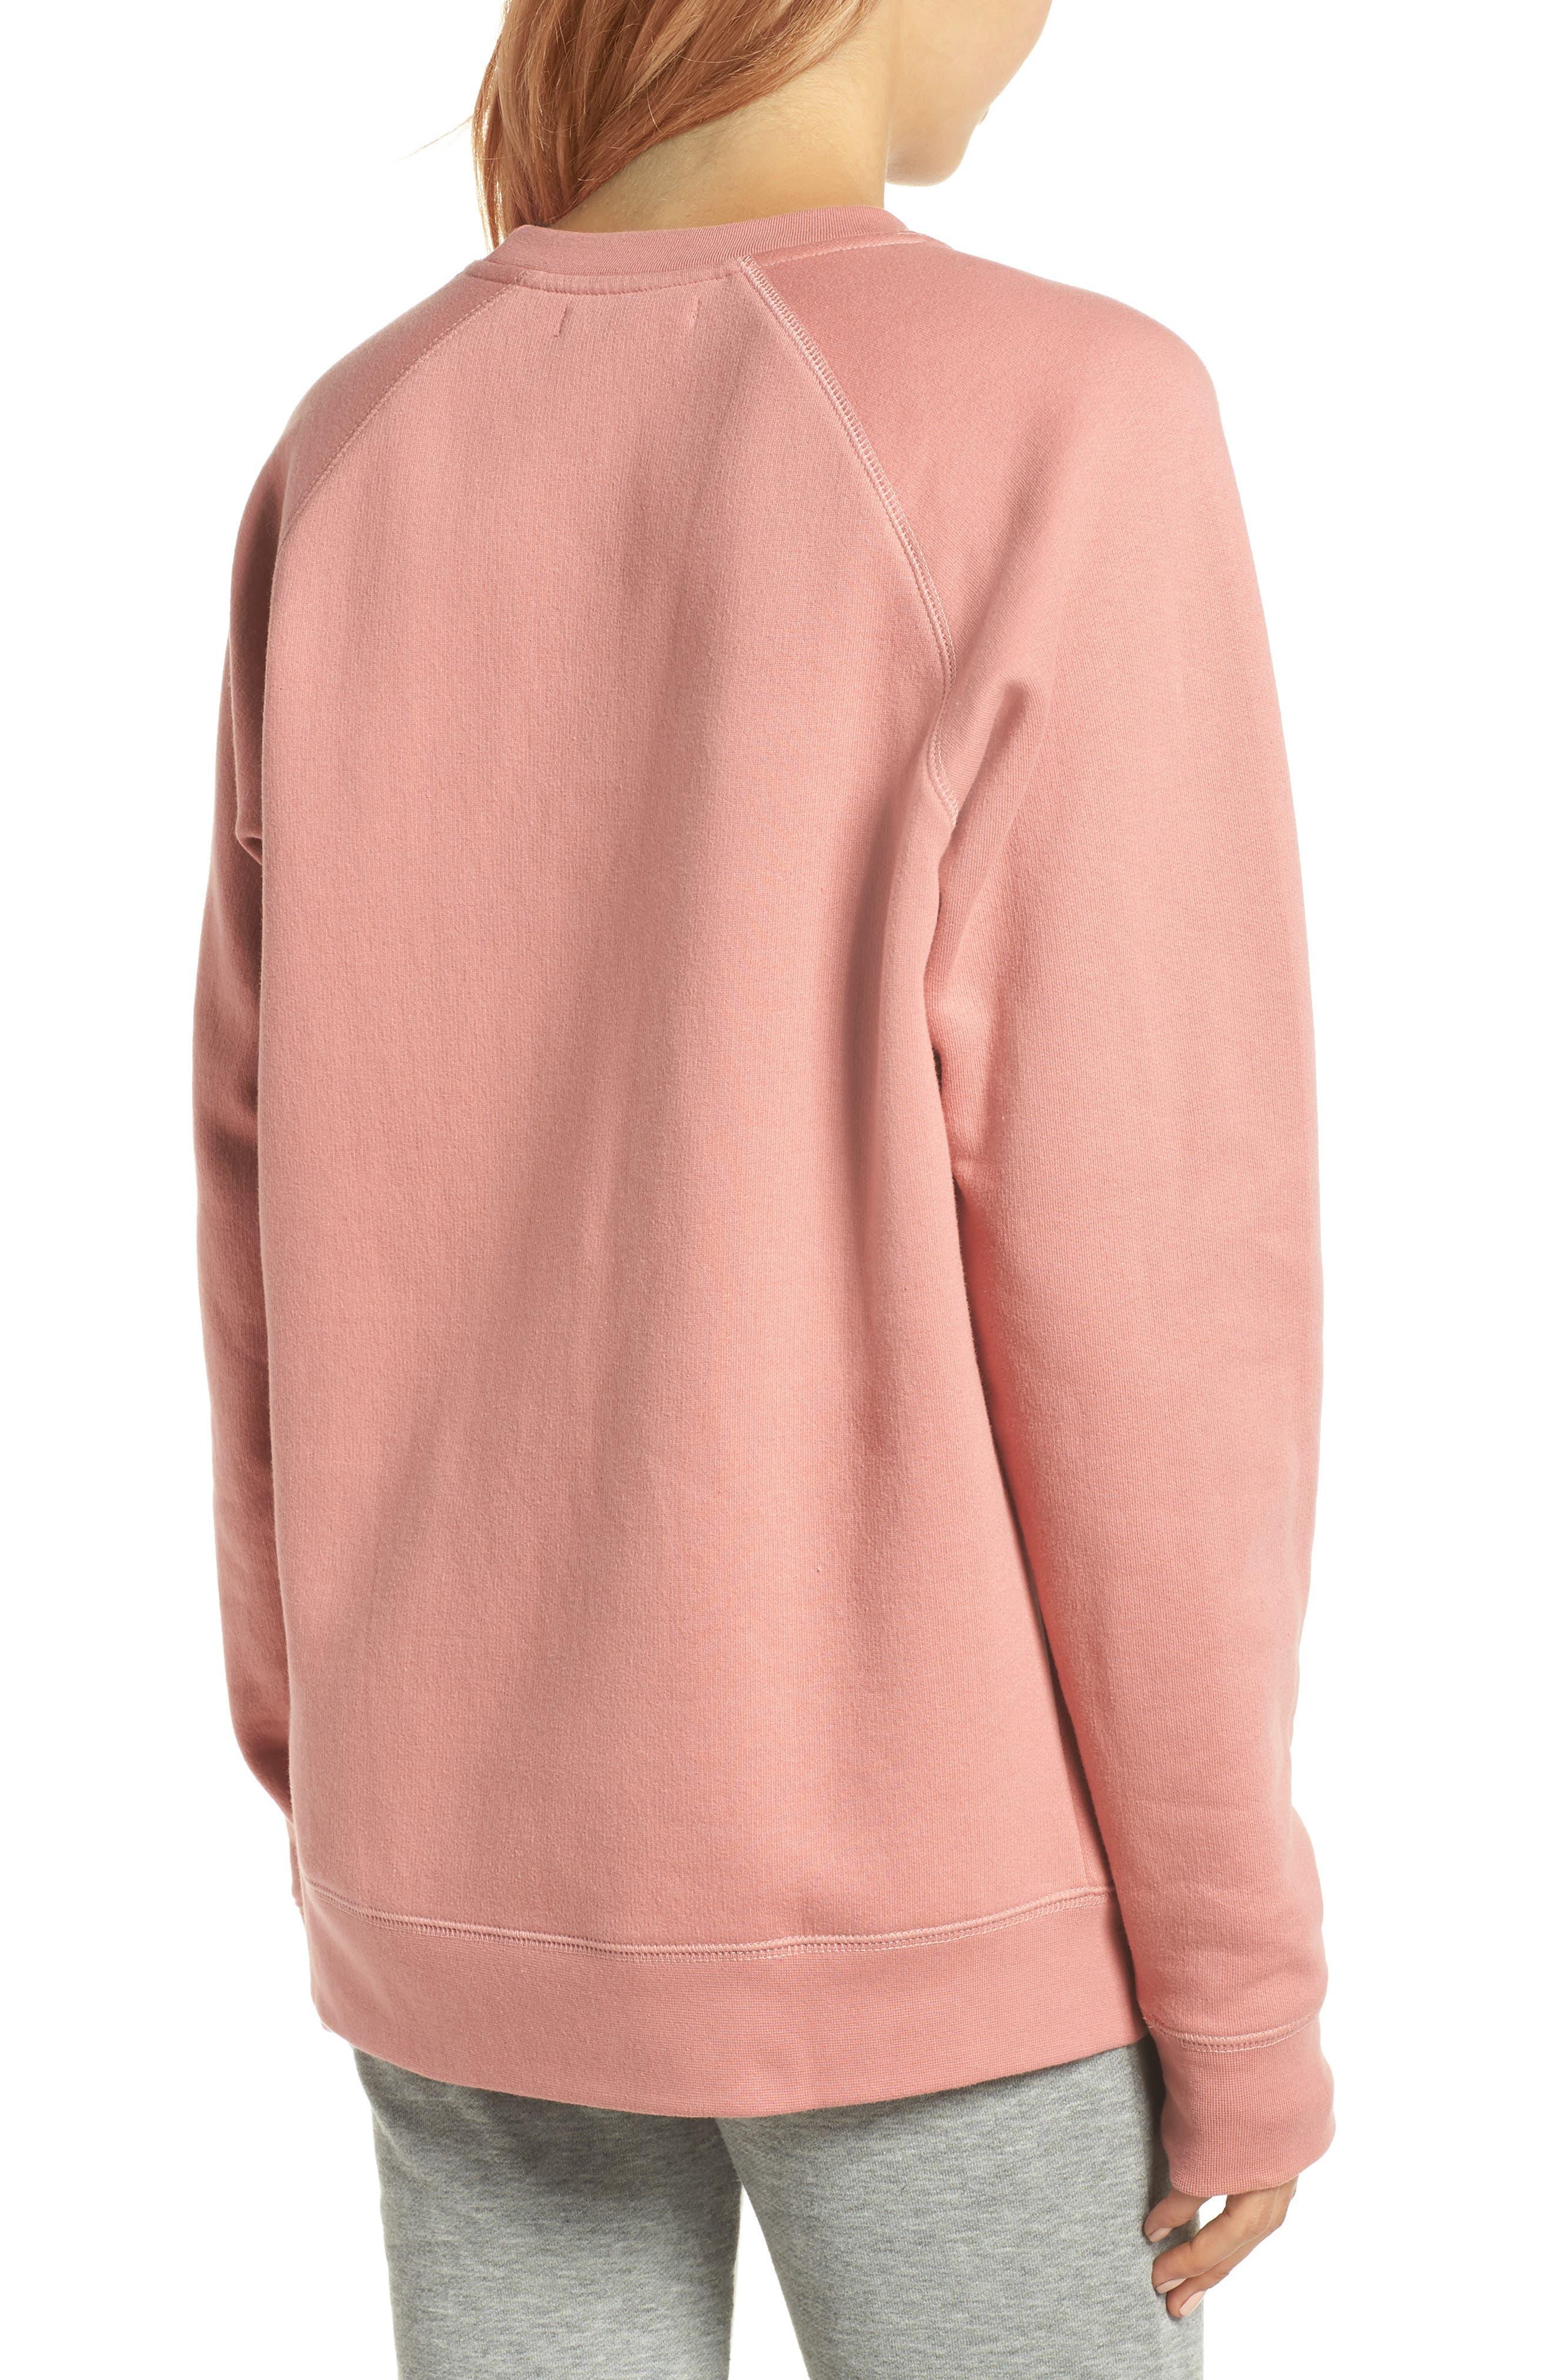 Redhead Crewneck Sweatshirt,                             Alternate thumbnail 2, color,                             Dusty Rose